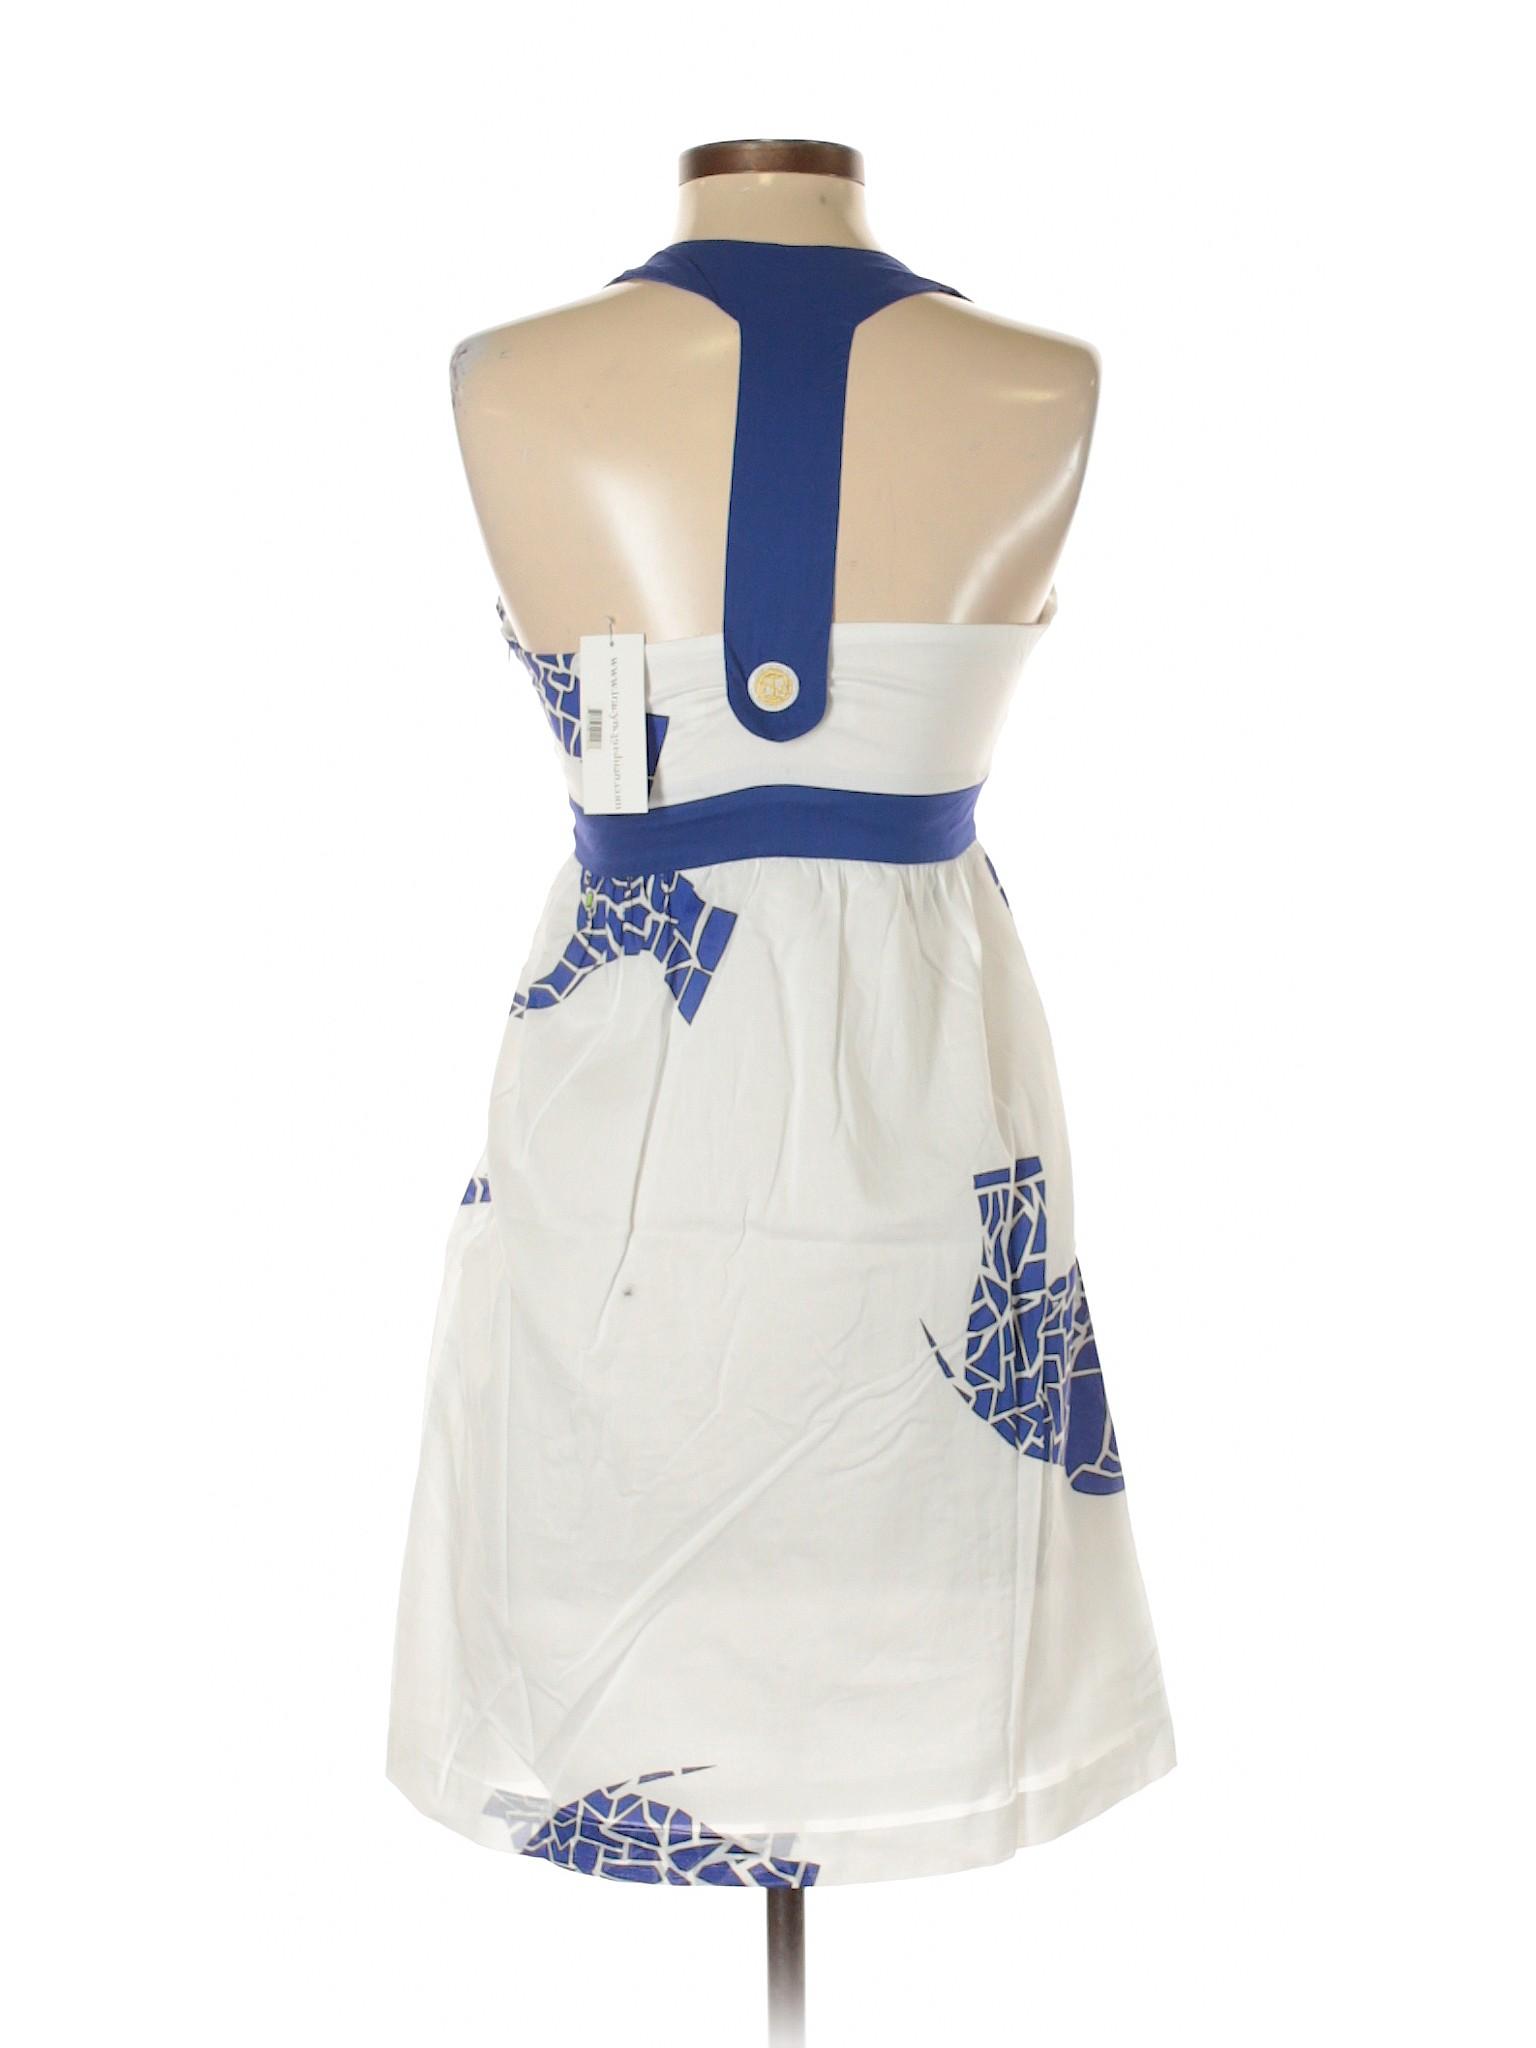 Casual NEGOSHIAN TRACY Selling Casual Selling TRACY TRACY NEGOSHIAN Selling Casual NEGOSHIAN Dress Dress B16fa